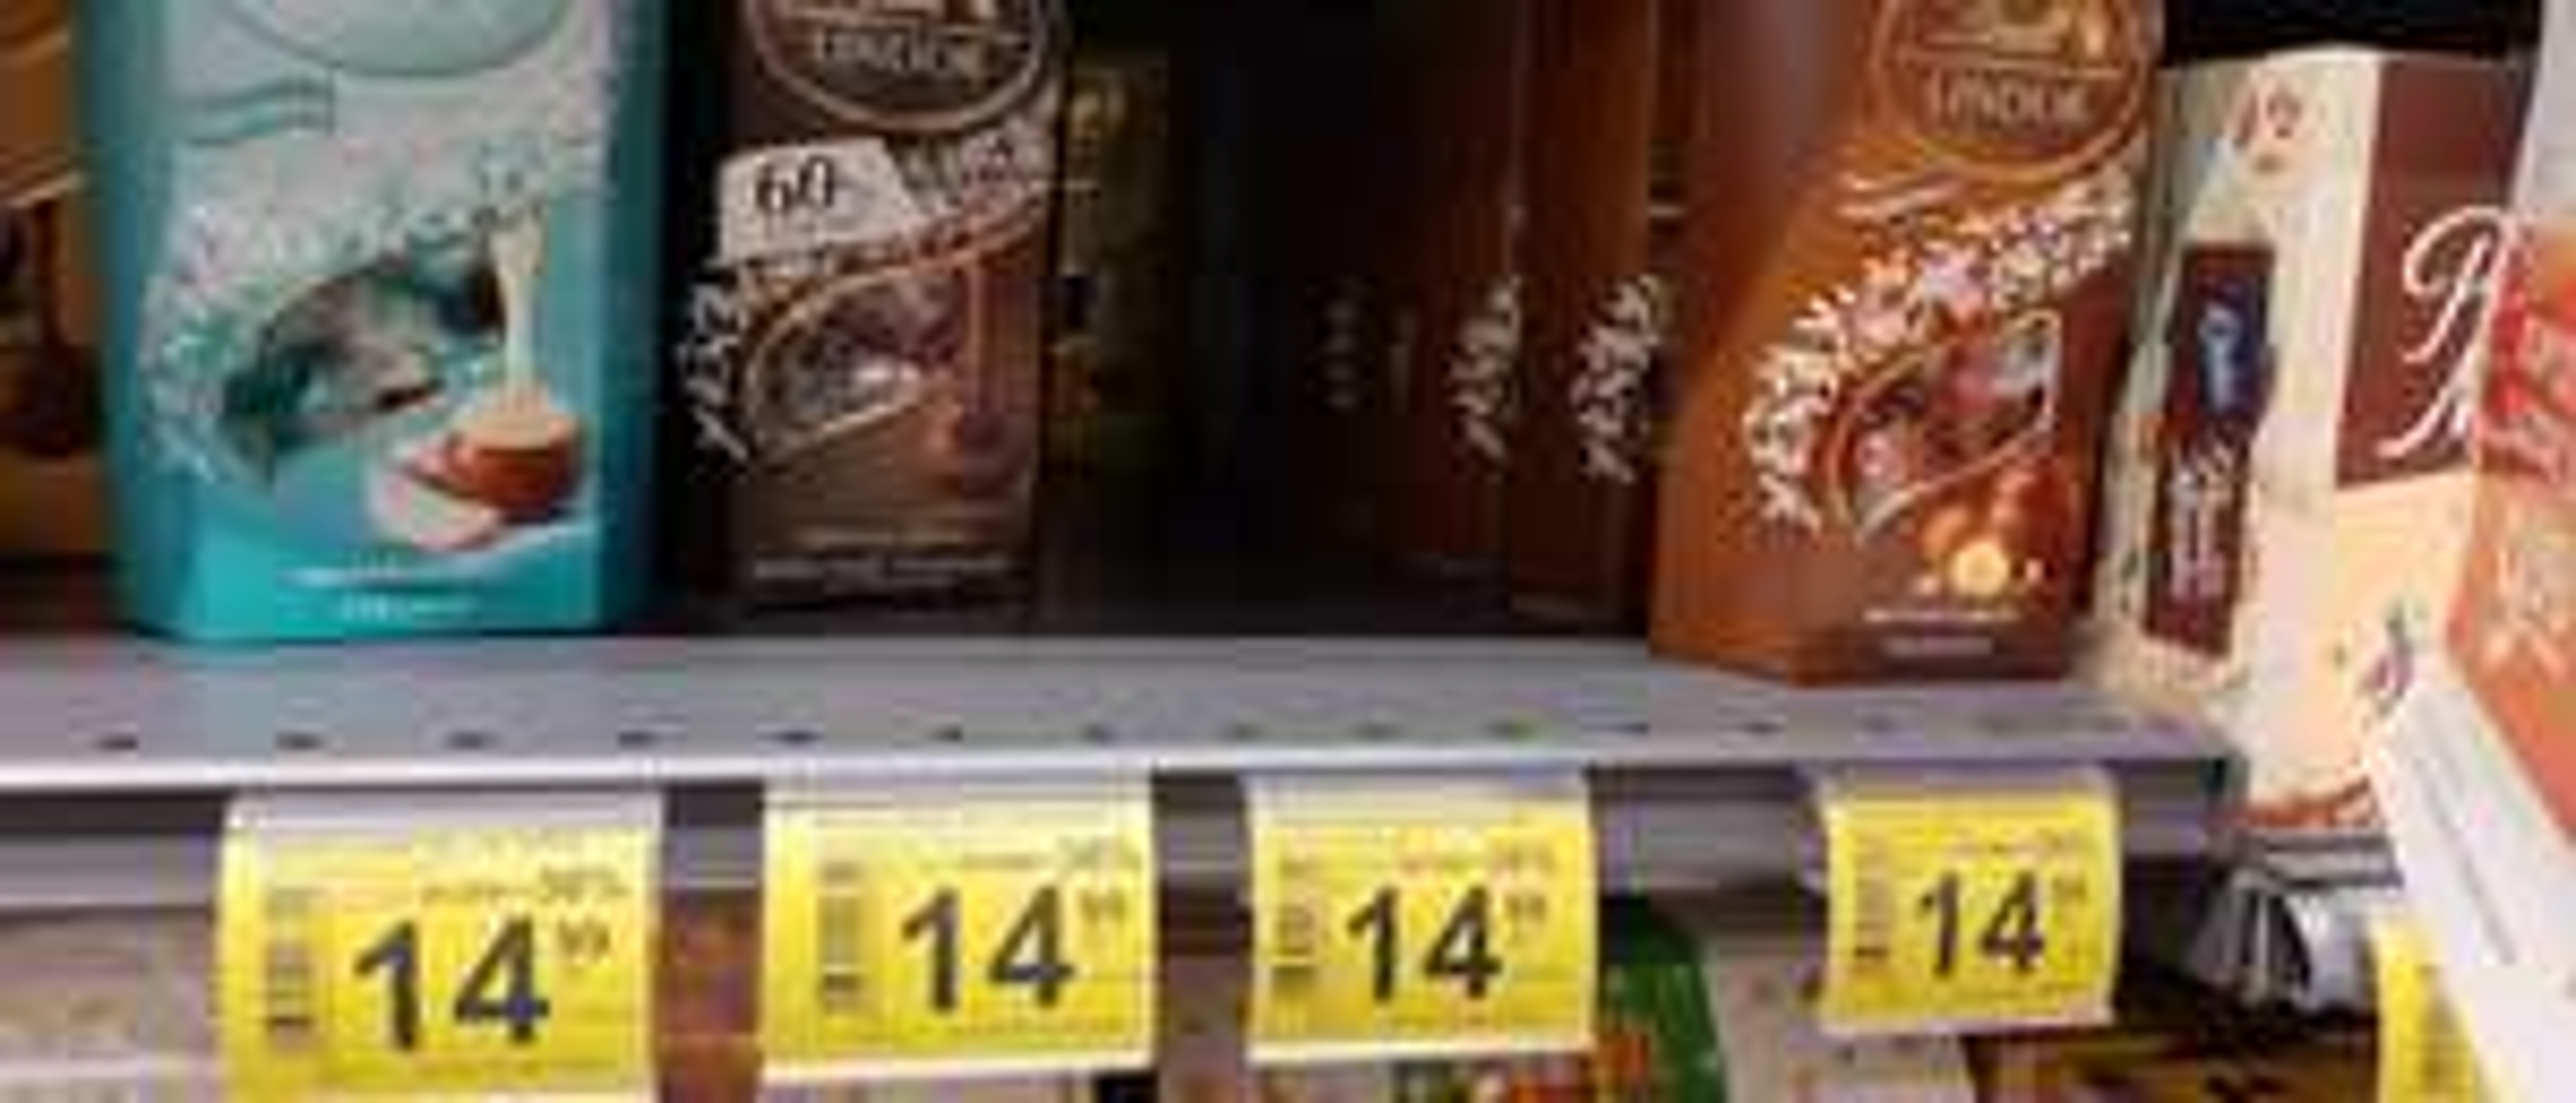 Lindt Praliny Lindor 200 g w Carrefour cena 74,95 PLN/kg